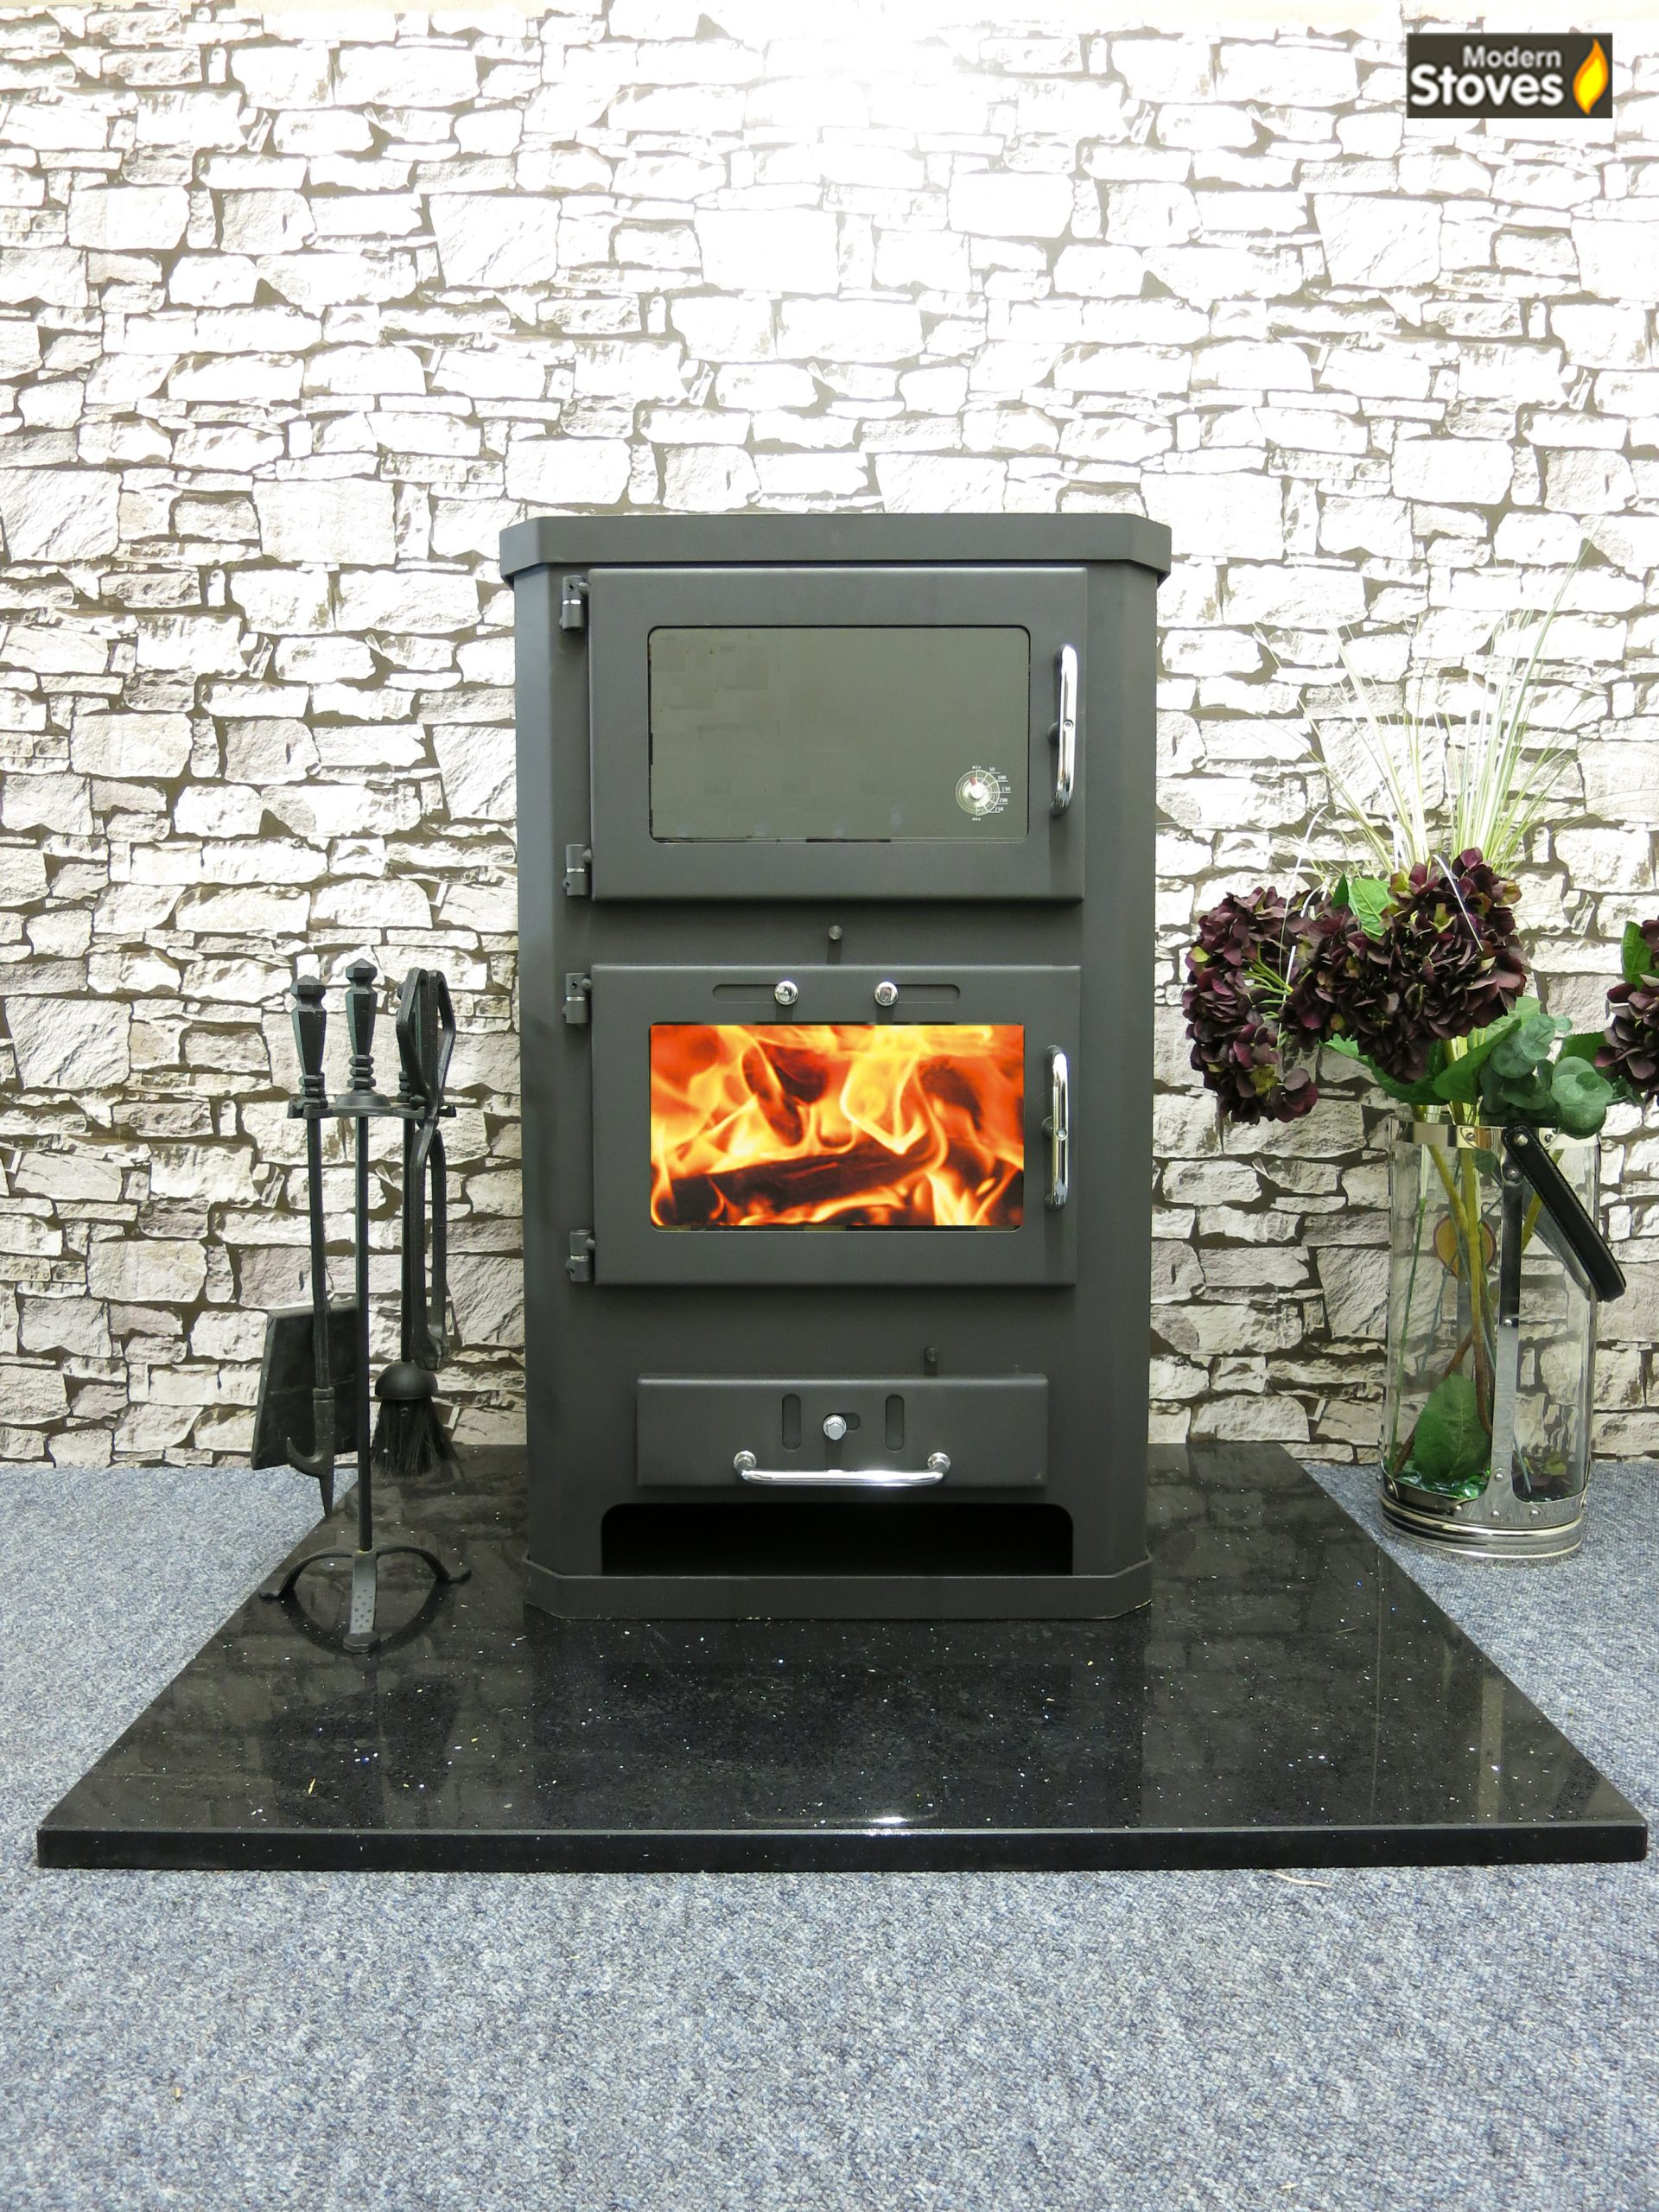 Comfort K Cooker stove